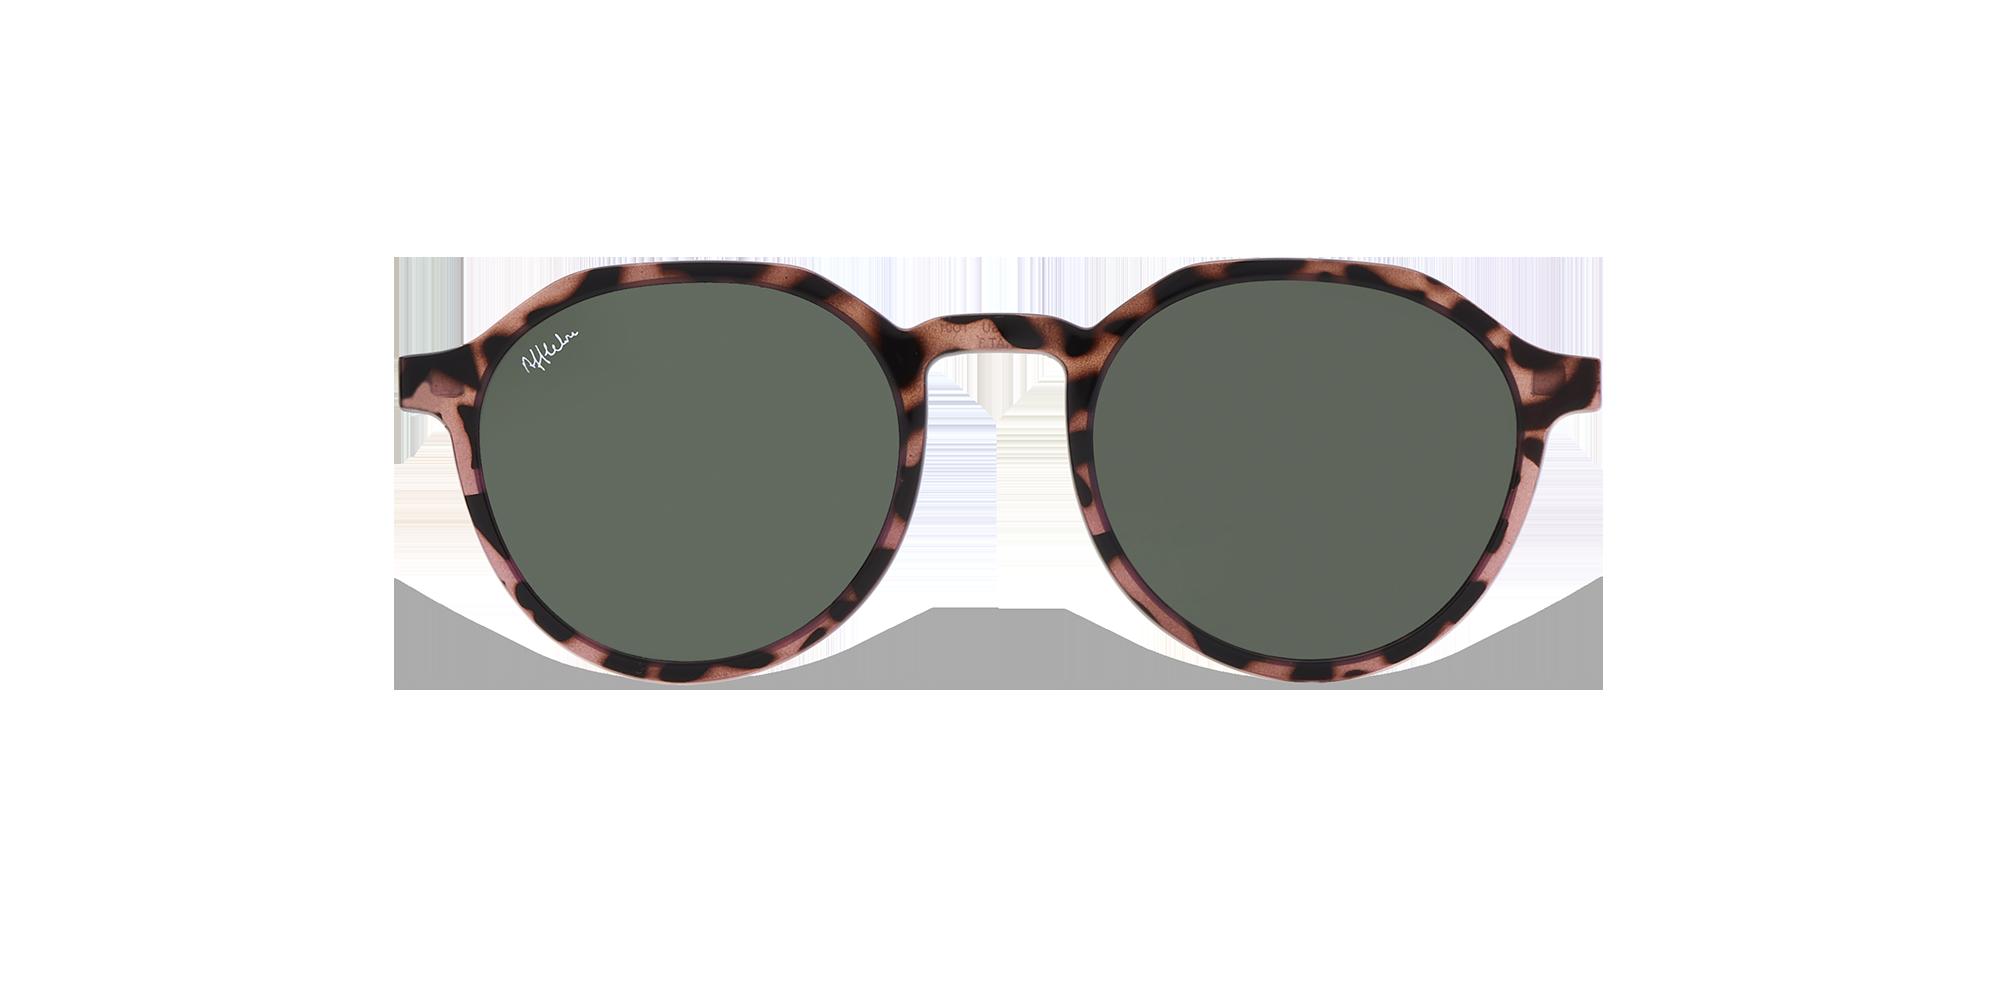 afflelou/france/products/smart_clip/clips_glasses/07630036428931_face.png